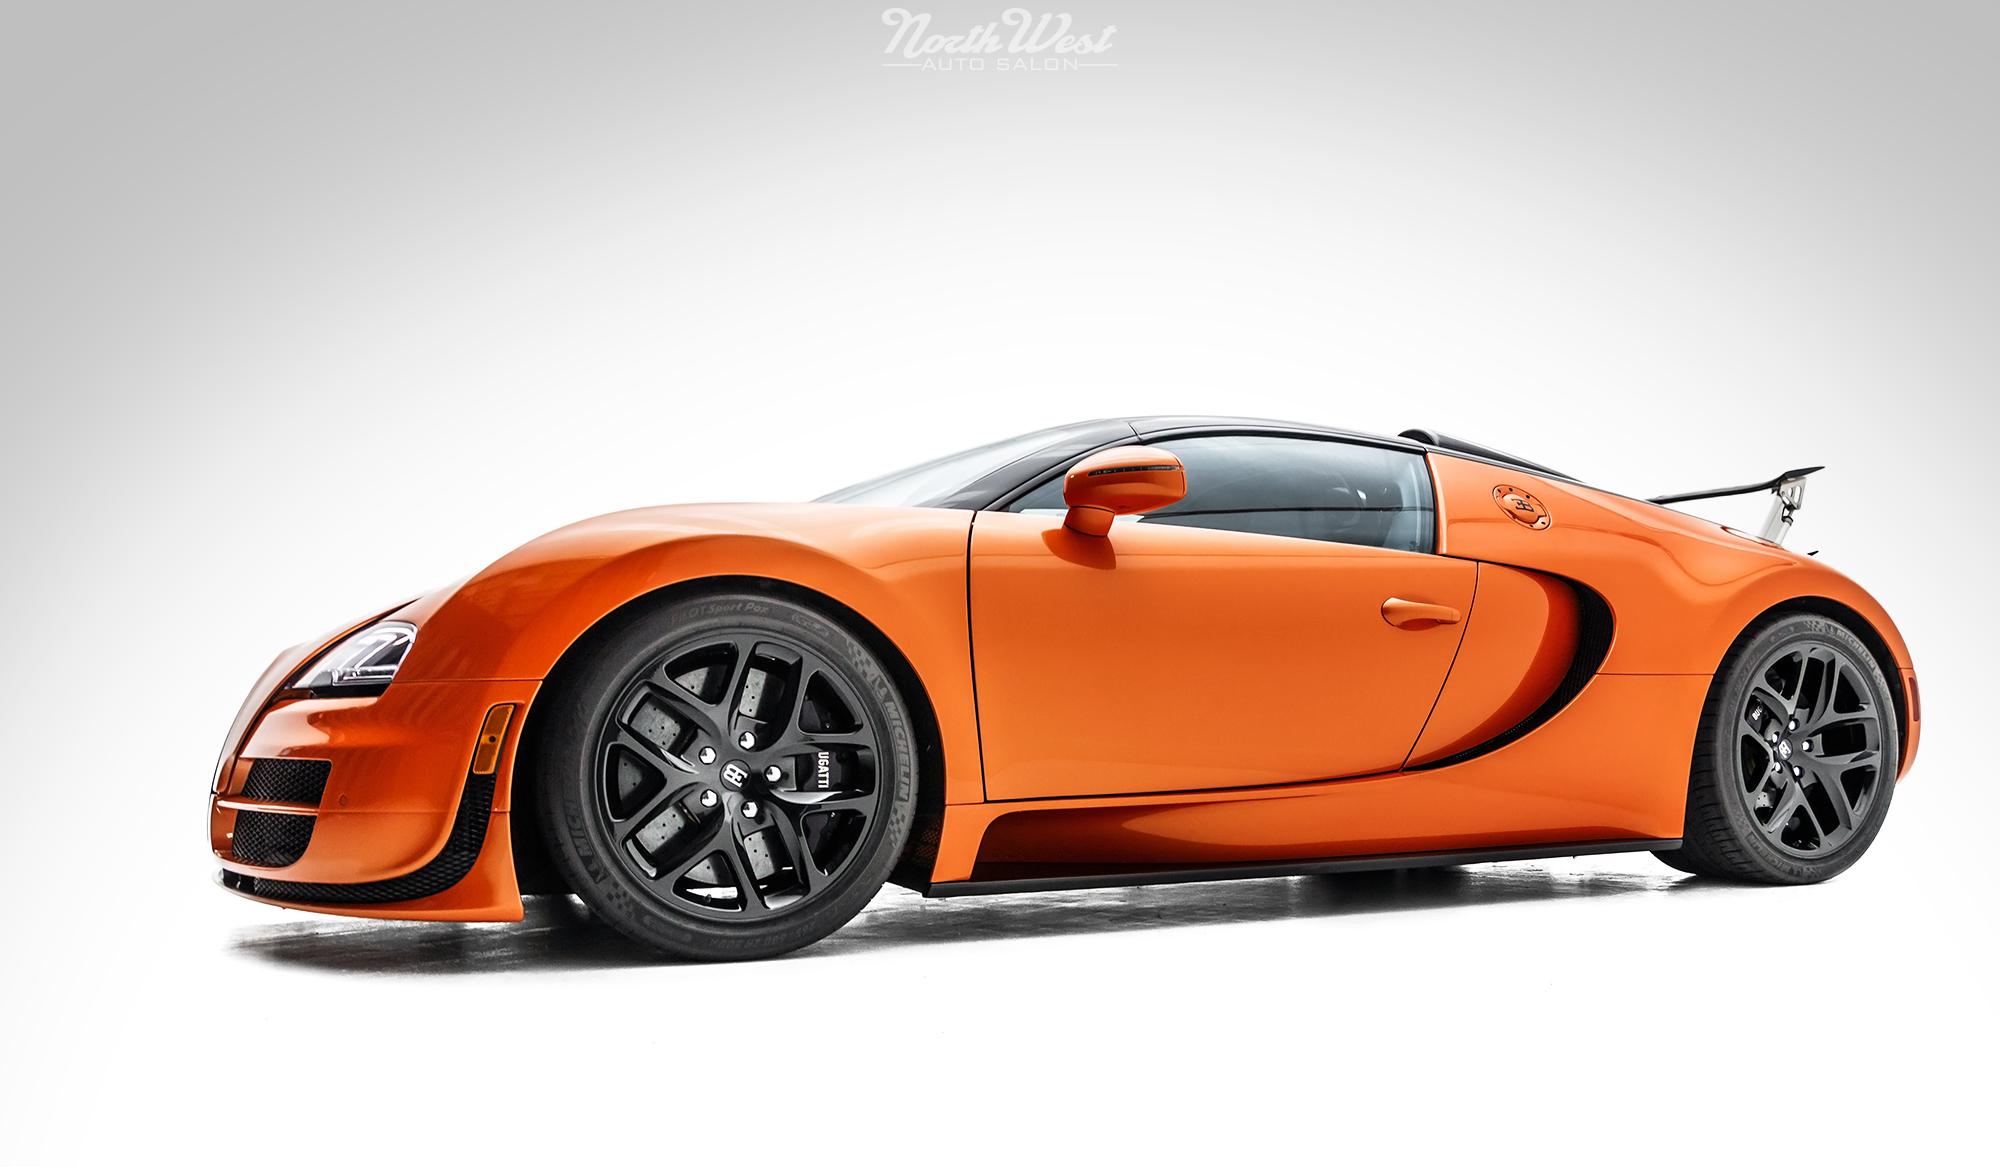 bugatti veyron vitesse detailed in seattle. Black Bedroom Furniture Sets. Home Design Ideas